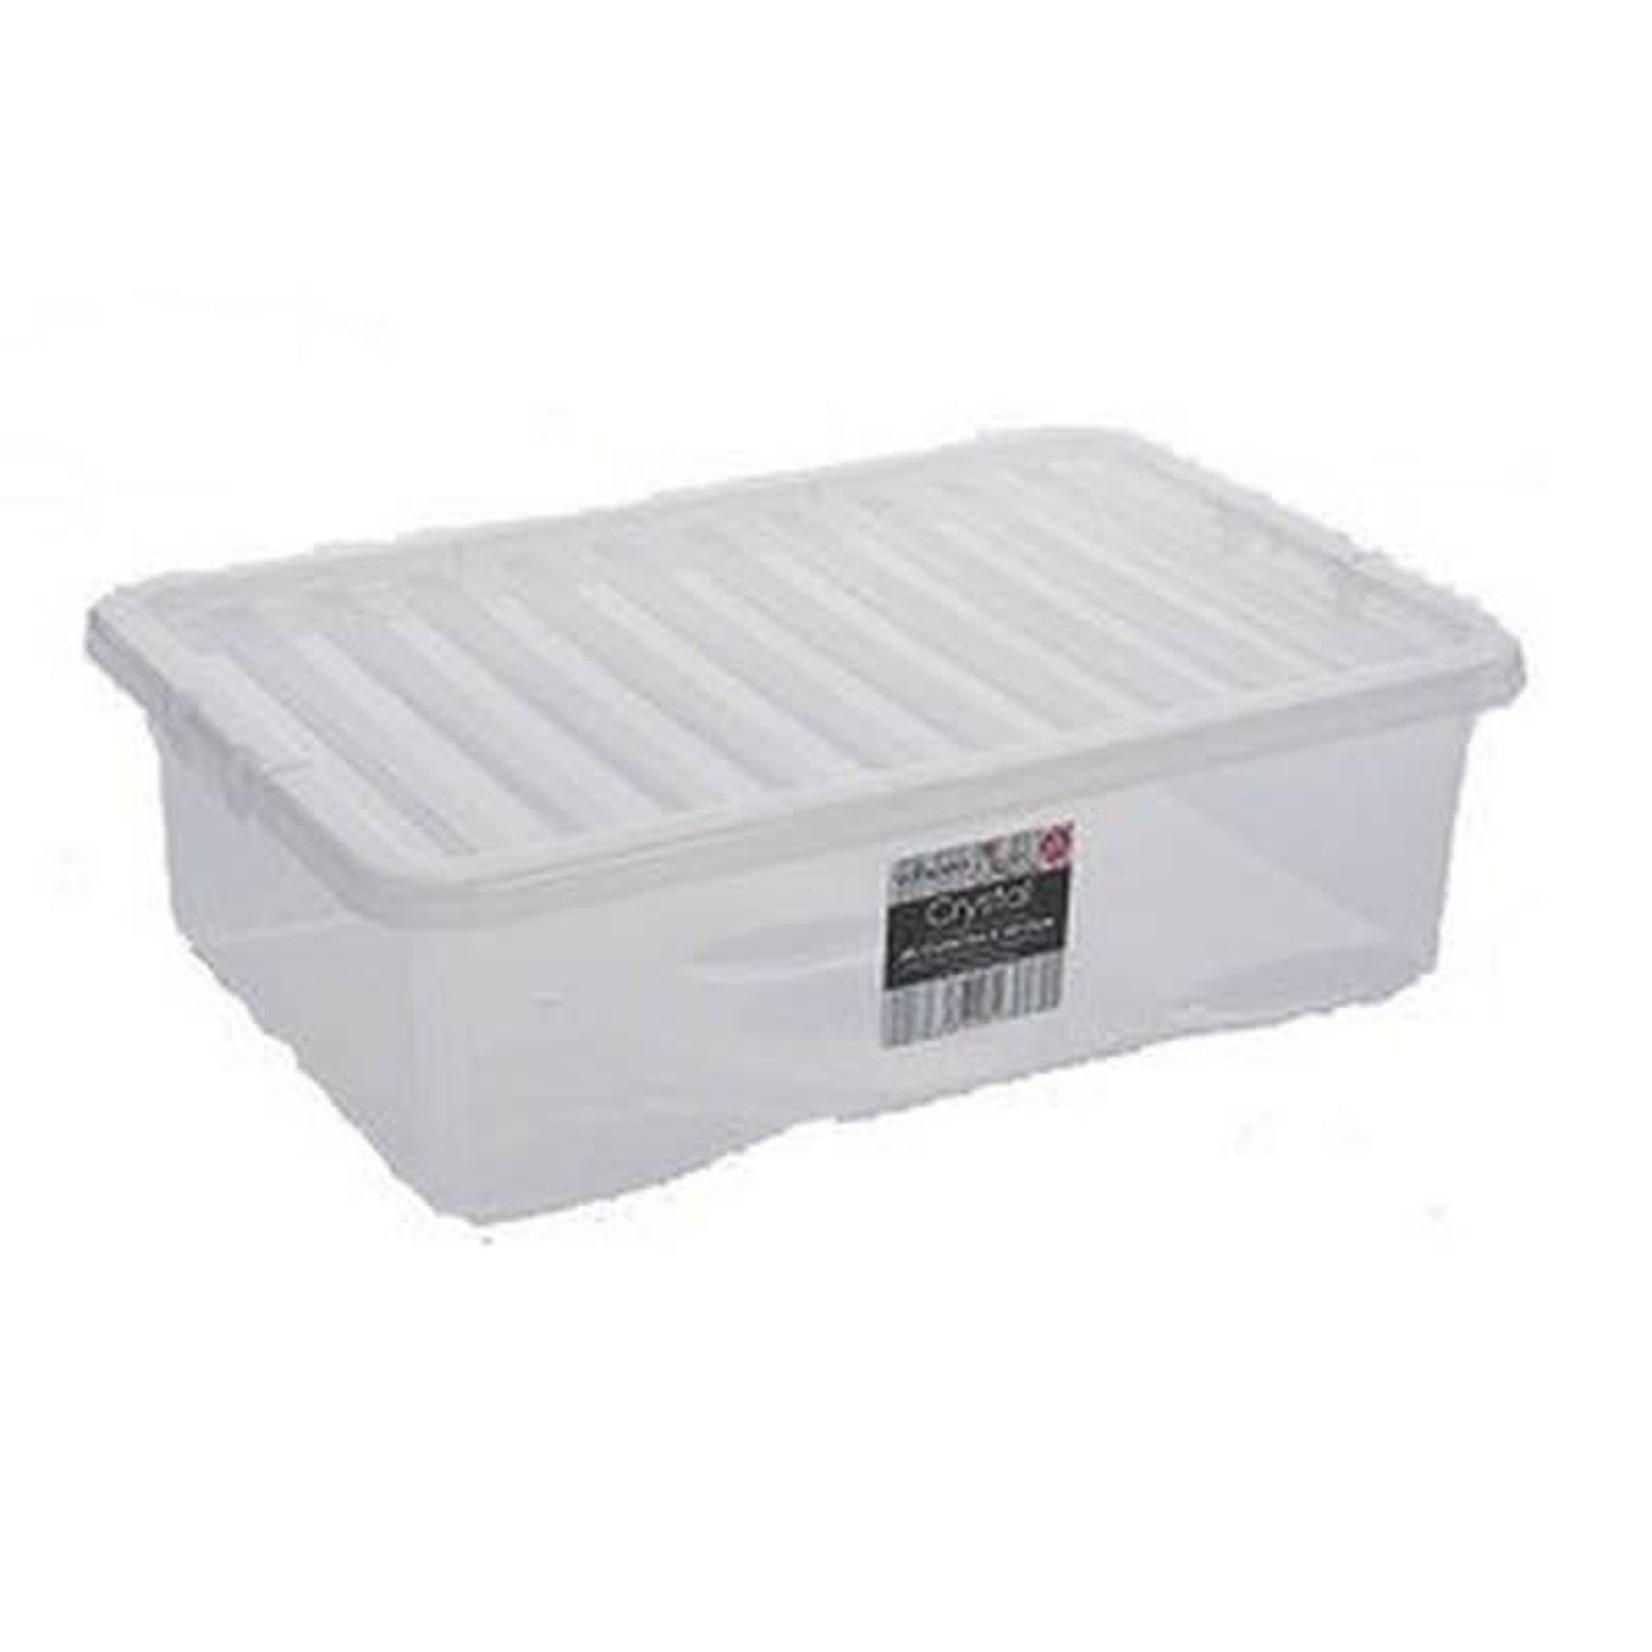 Wham CRYSTAL 32L BOX & LID CLEAR